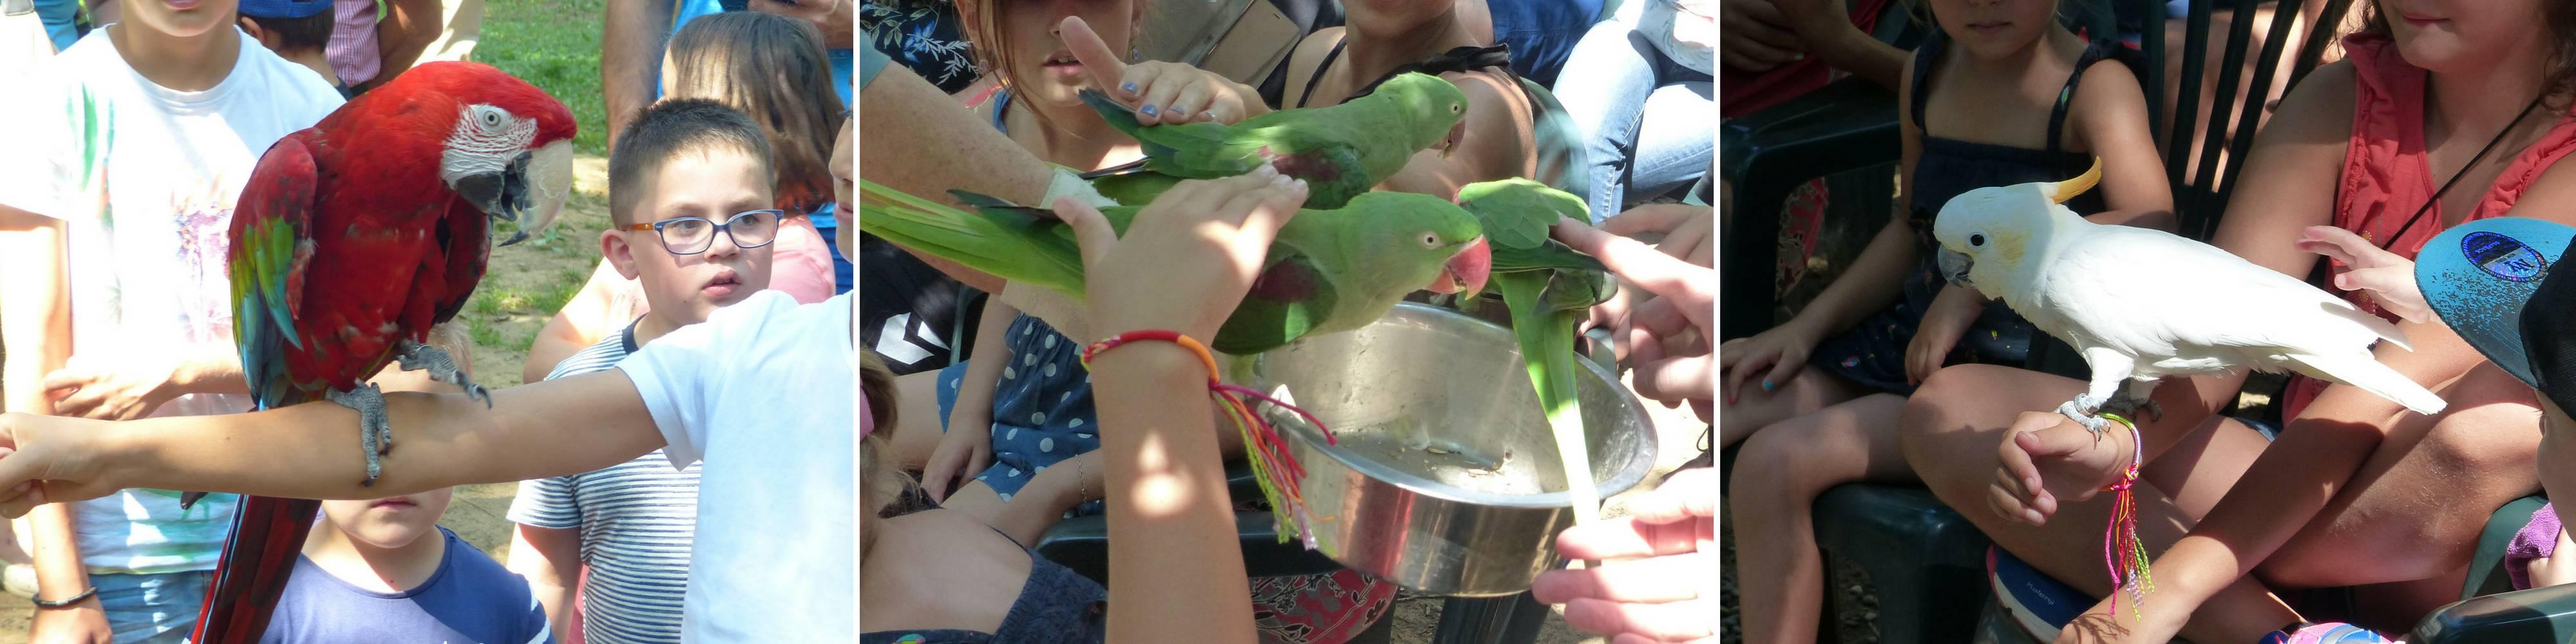 Parc perroquets Bren.jpg